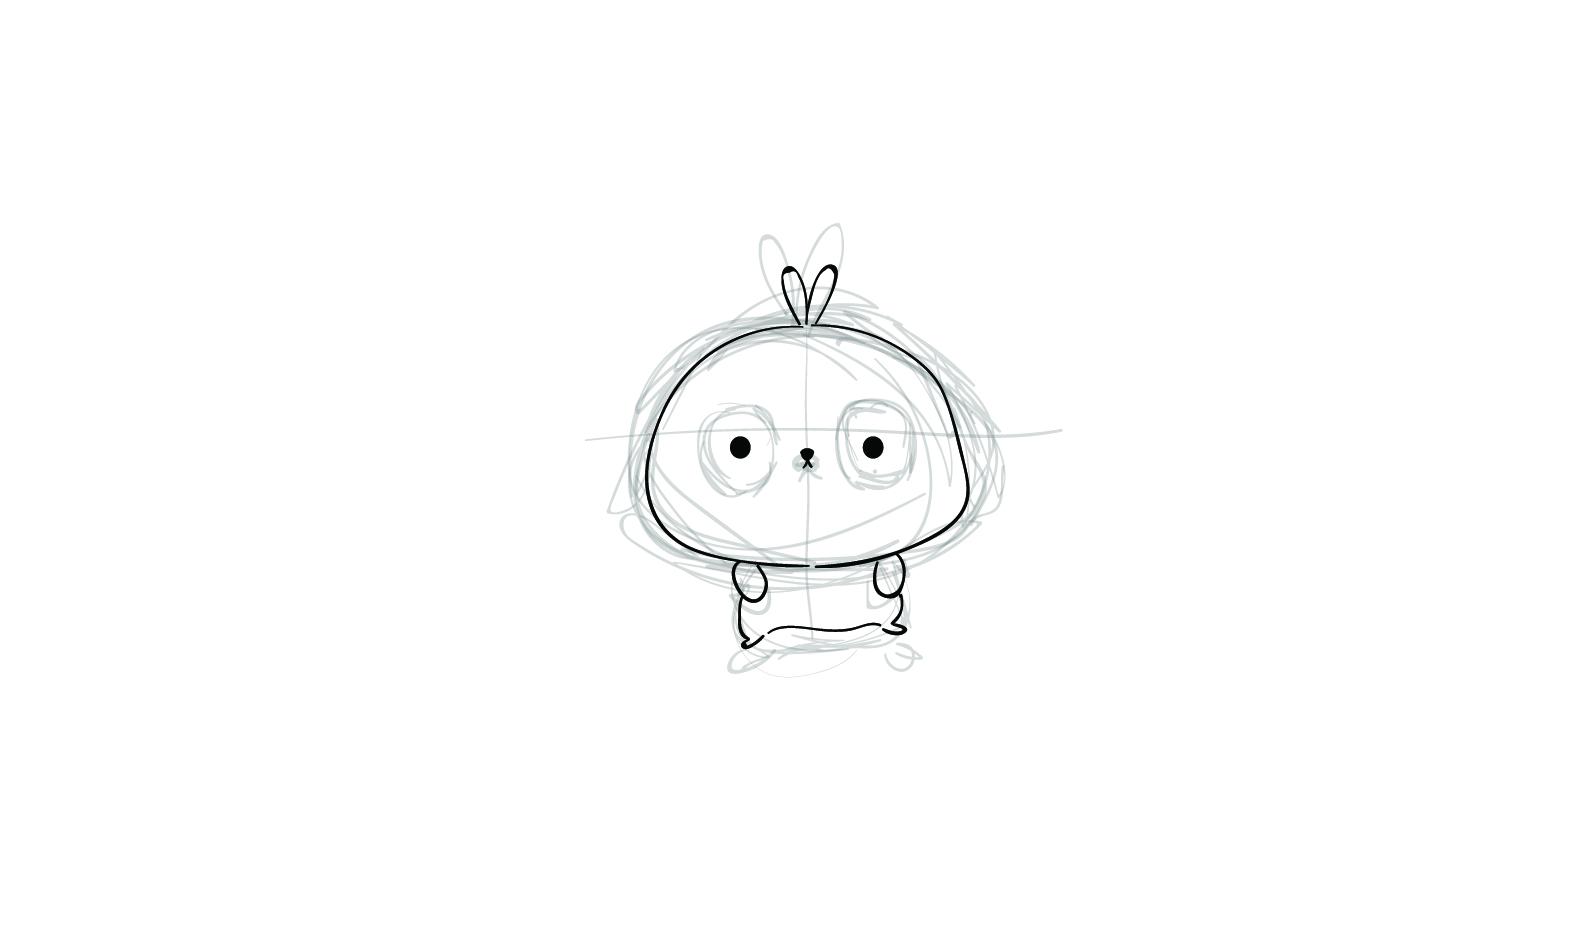 2019-07-08 Bunny Concept 3.jpg